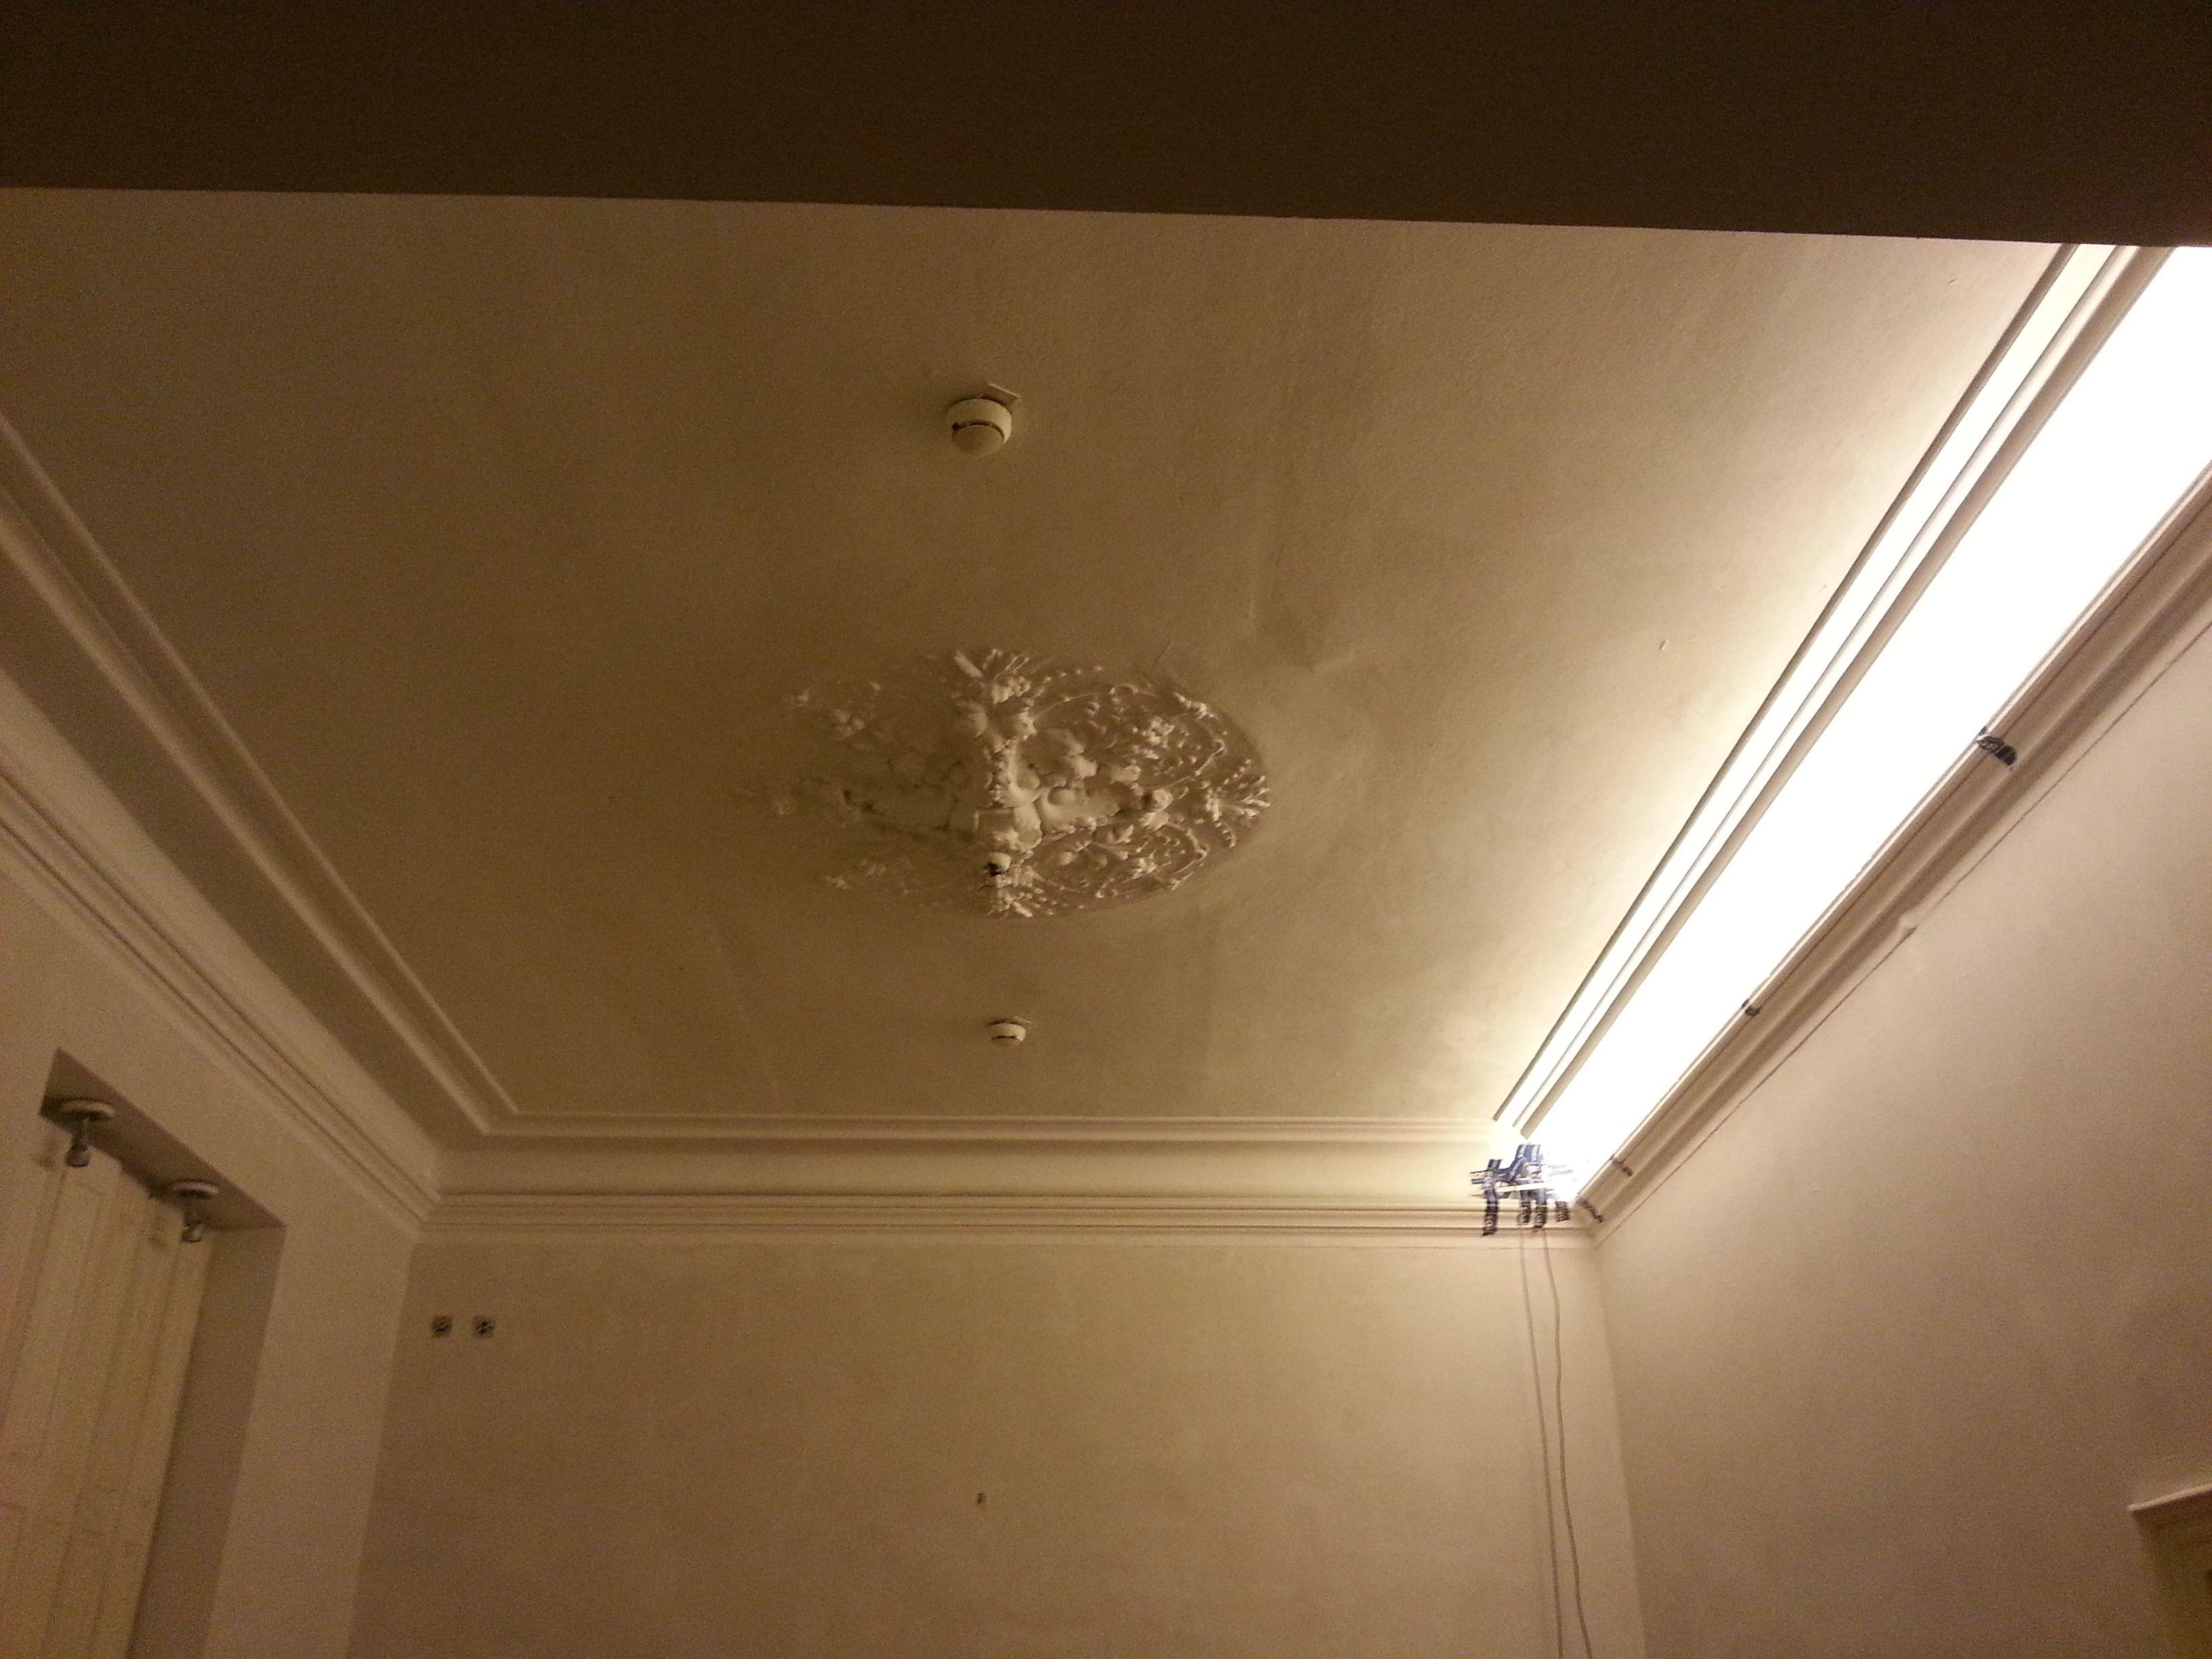 Stuckdecke Raum hinten. LED Probe. Warmweiß. | Vintage | Pinterest